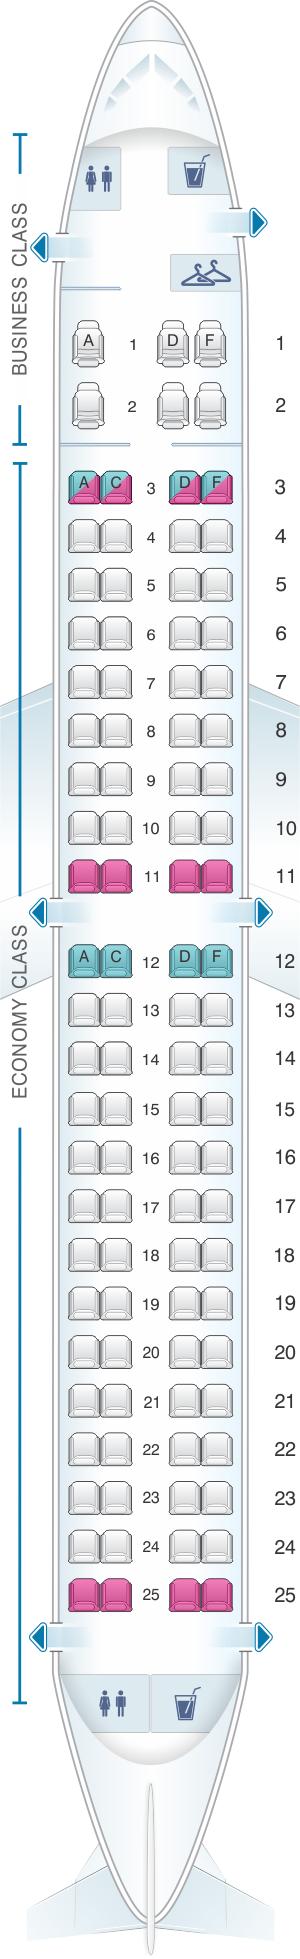 Seat map for Virgin Australia Embraer 190